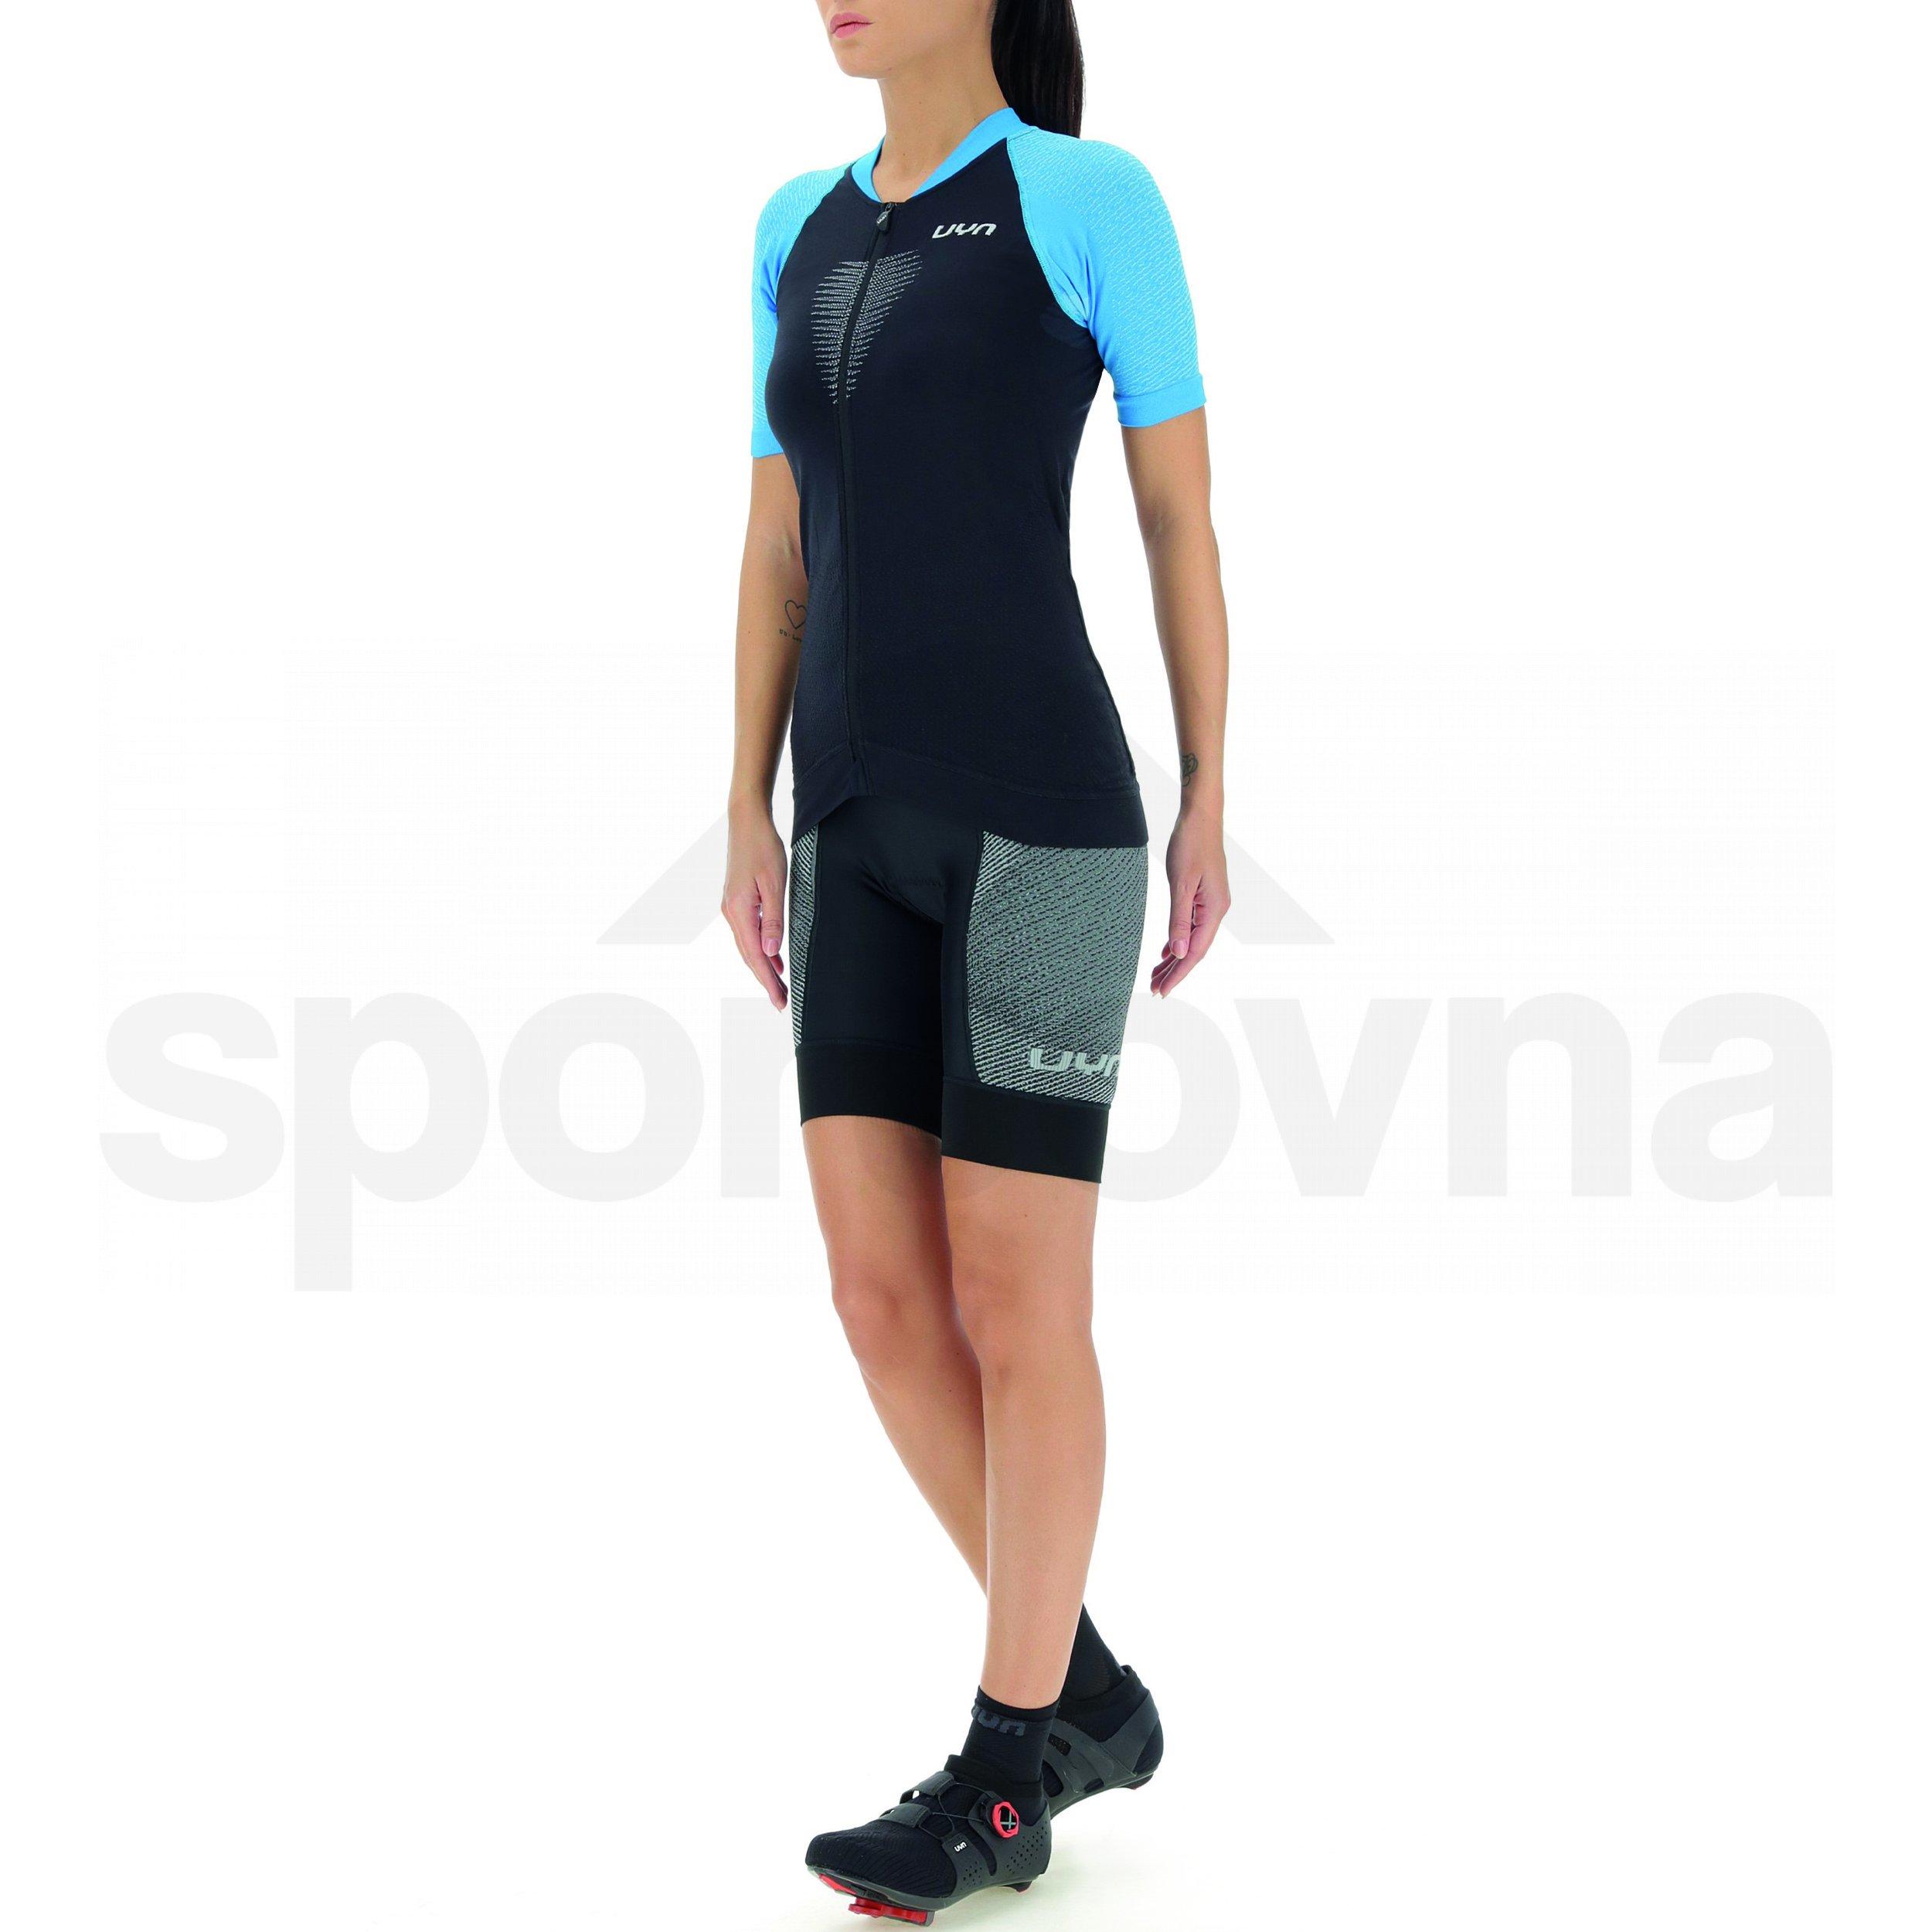 Cyklistický dres UYN Biking Grandfondo W - černá/modrá